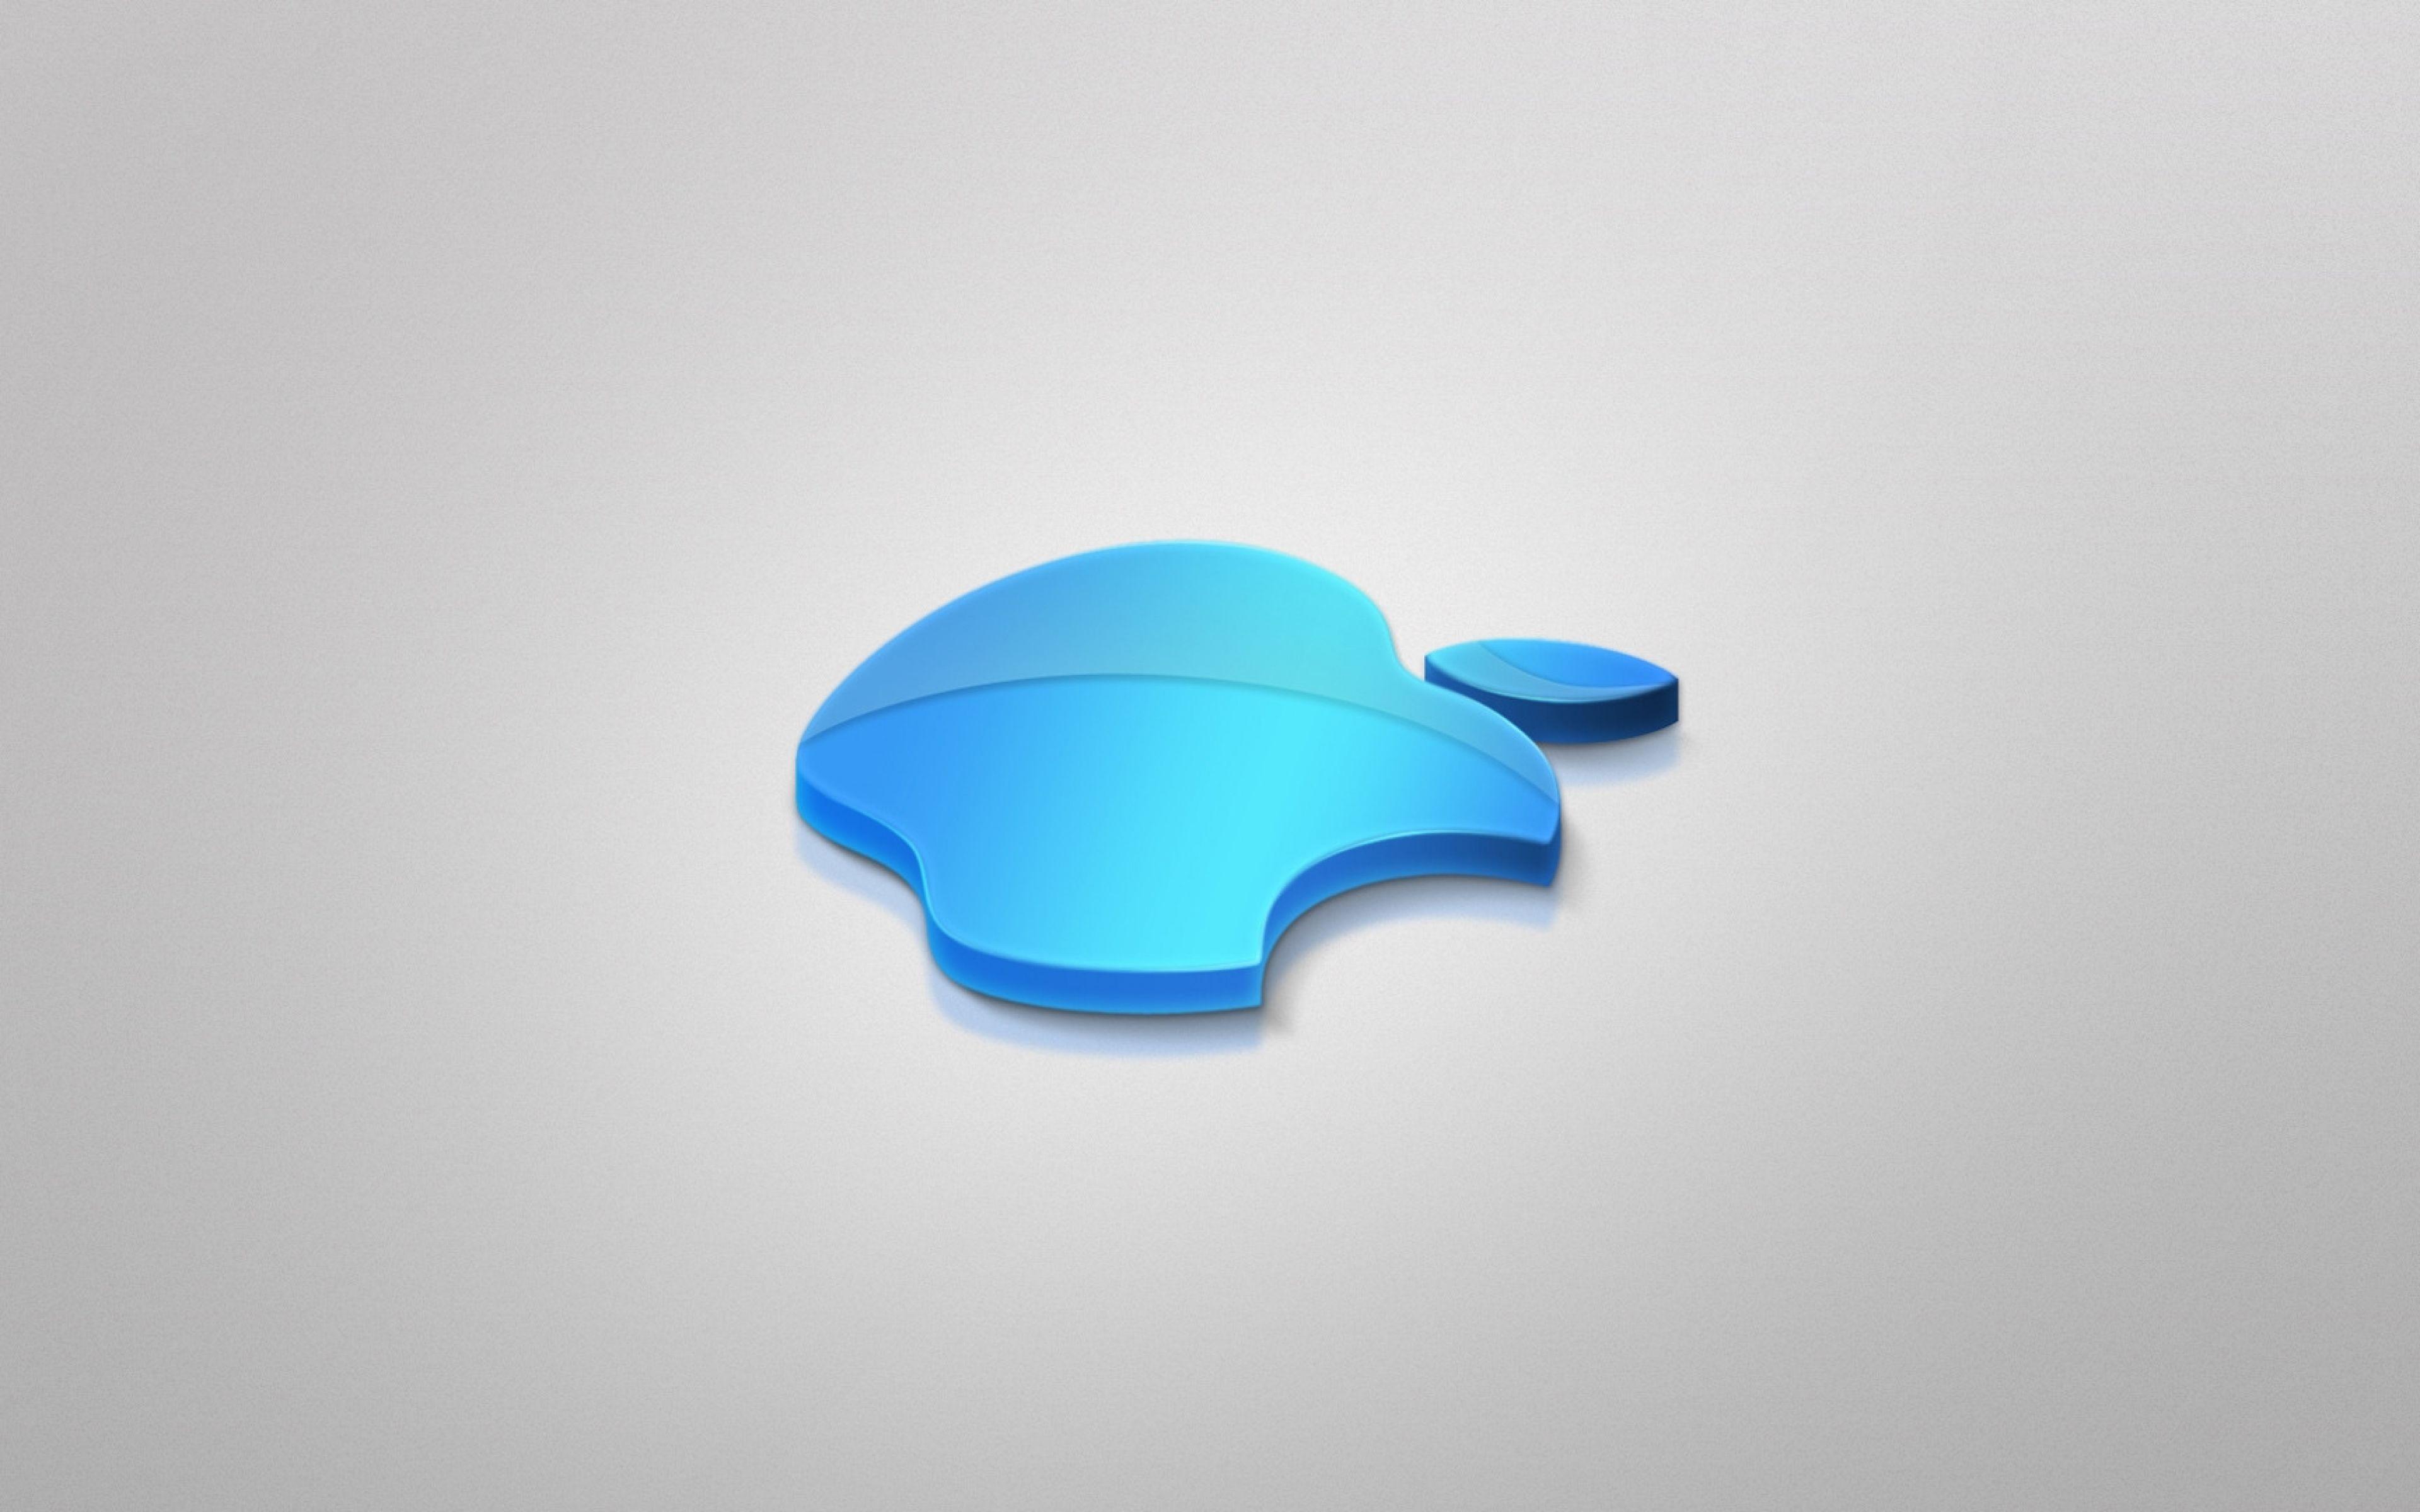 D Apple Logo iPhone Wallpaper iPod Wallpaper HD Free Download